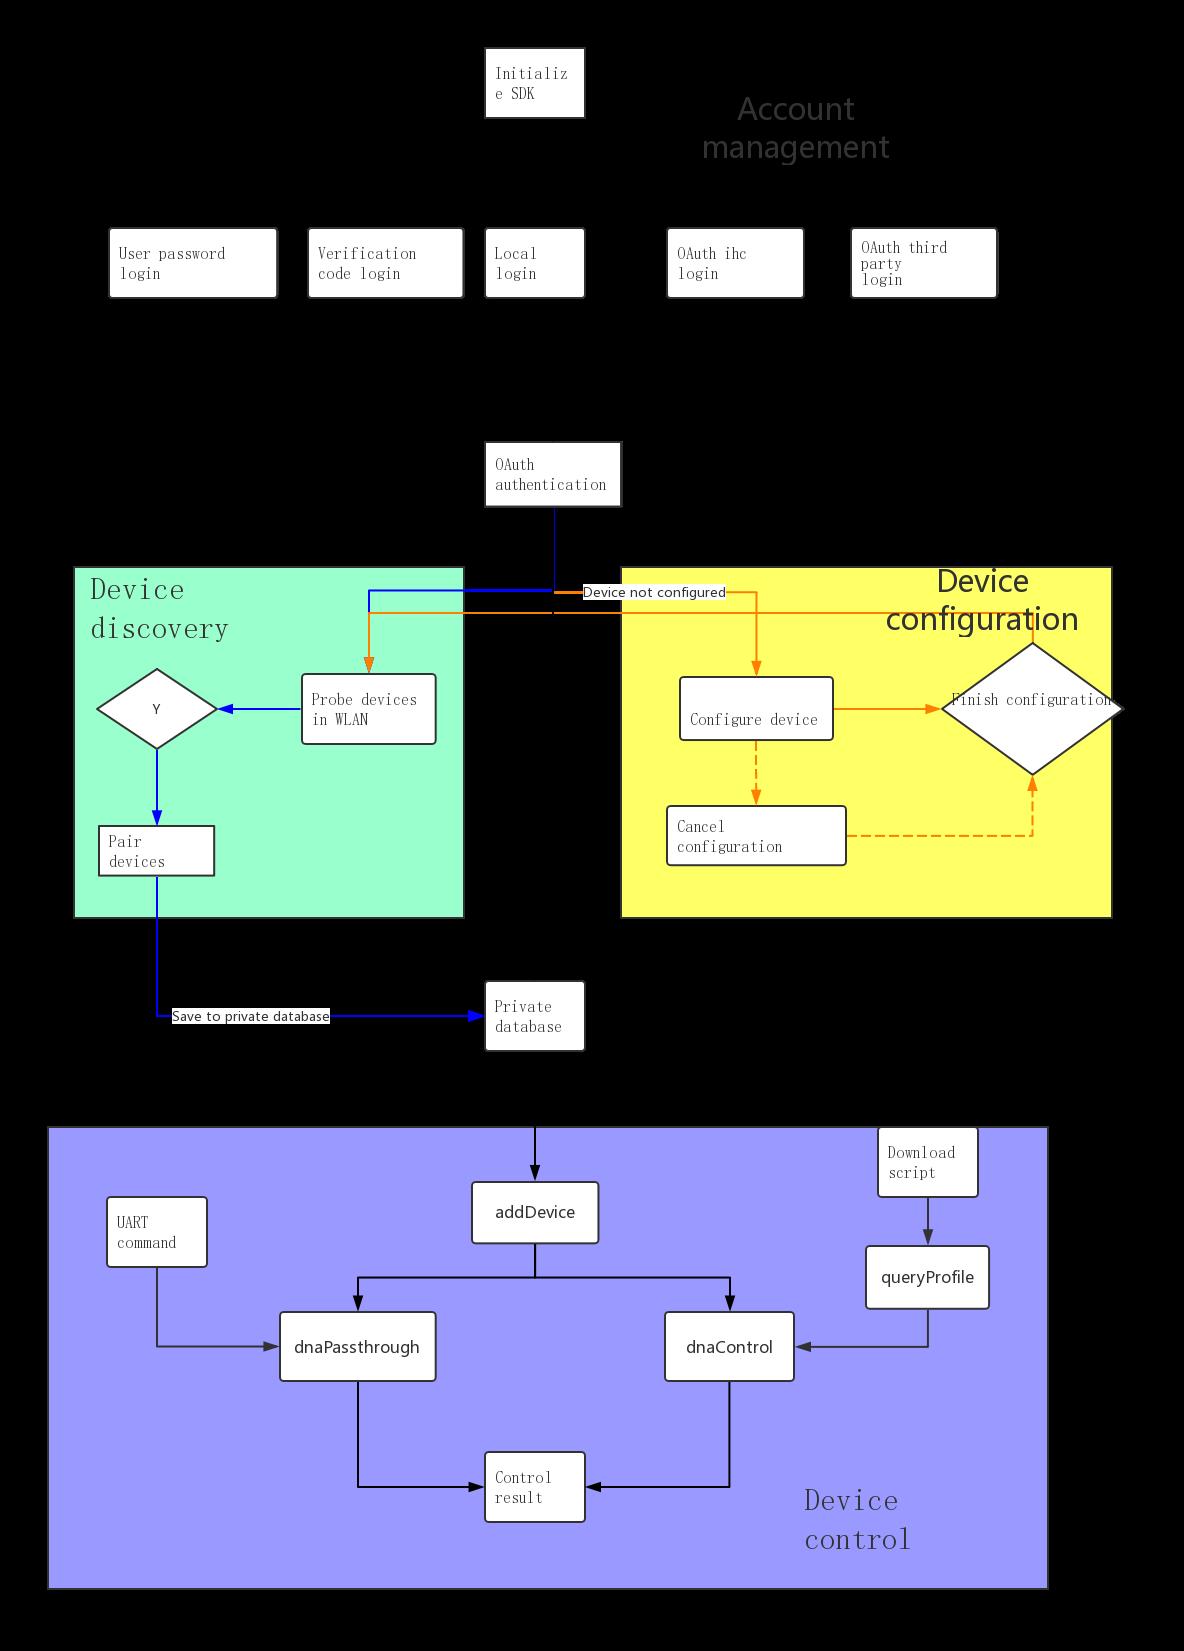 BroadLink Document